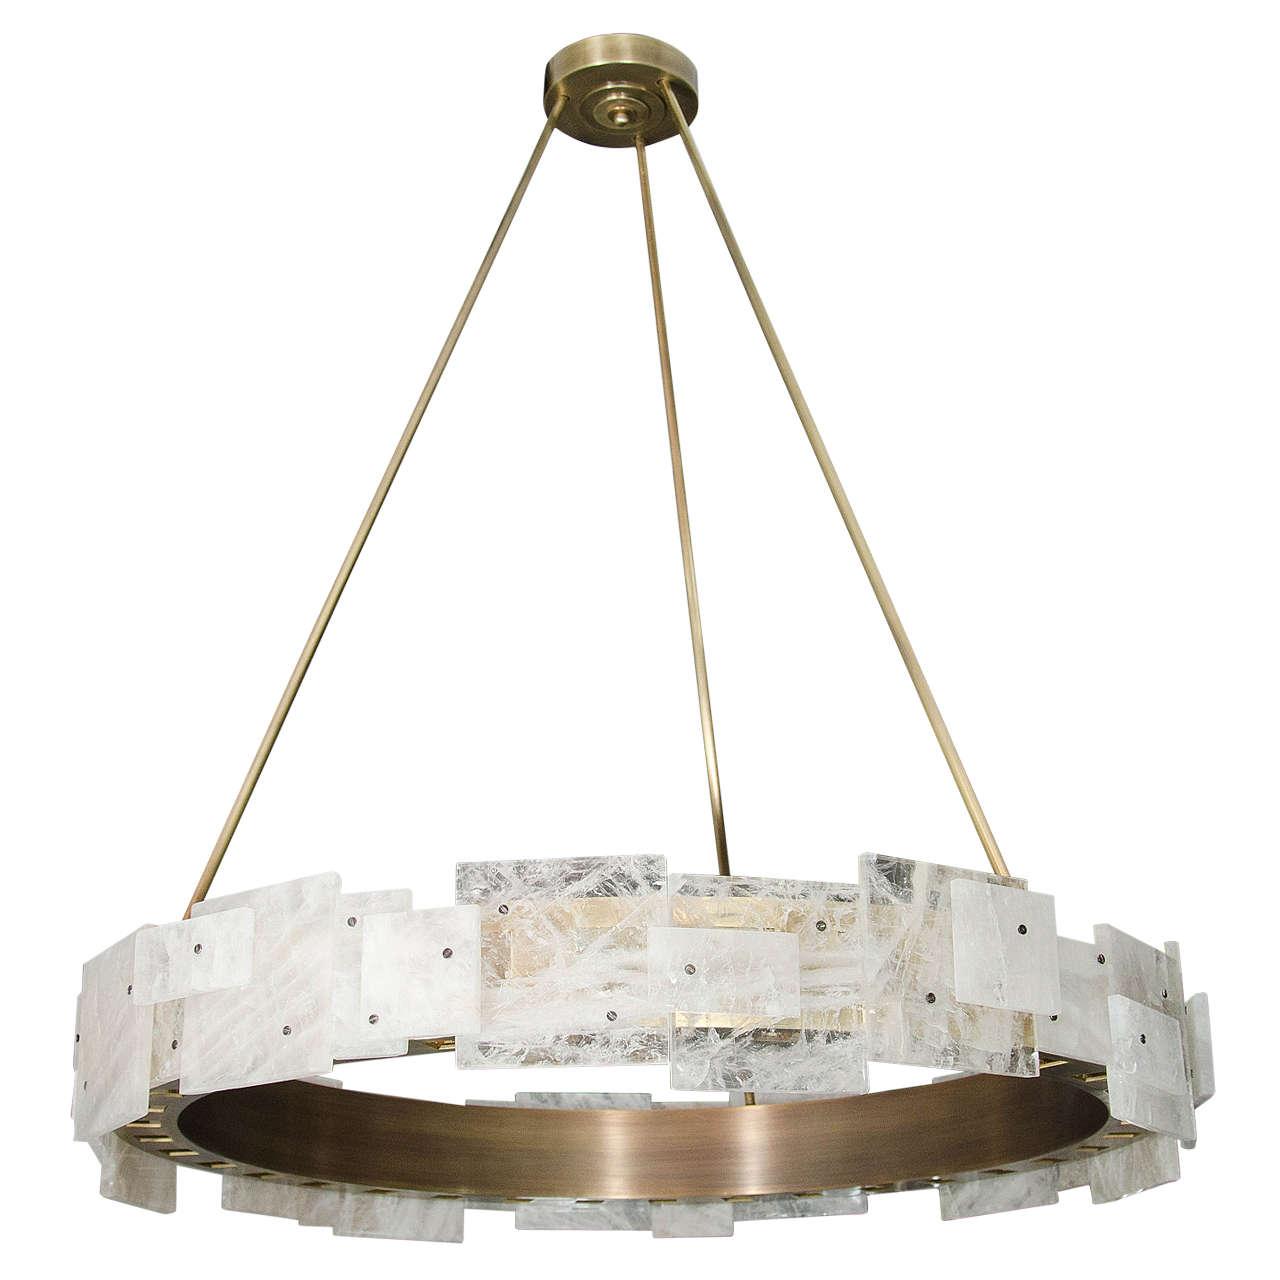 Antique rock chandelier antique bagues french cut rock crystal custom rock crystal and antique brass led chandelier at antique rock chandelier aloadofball Choice Image